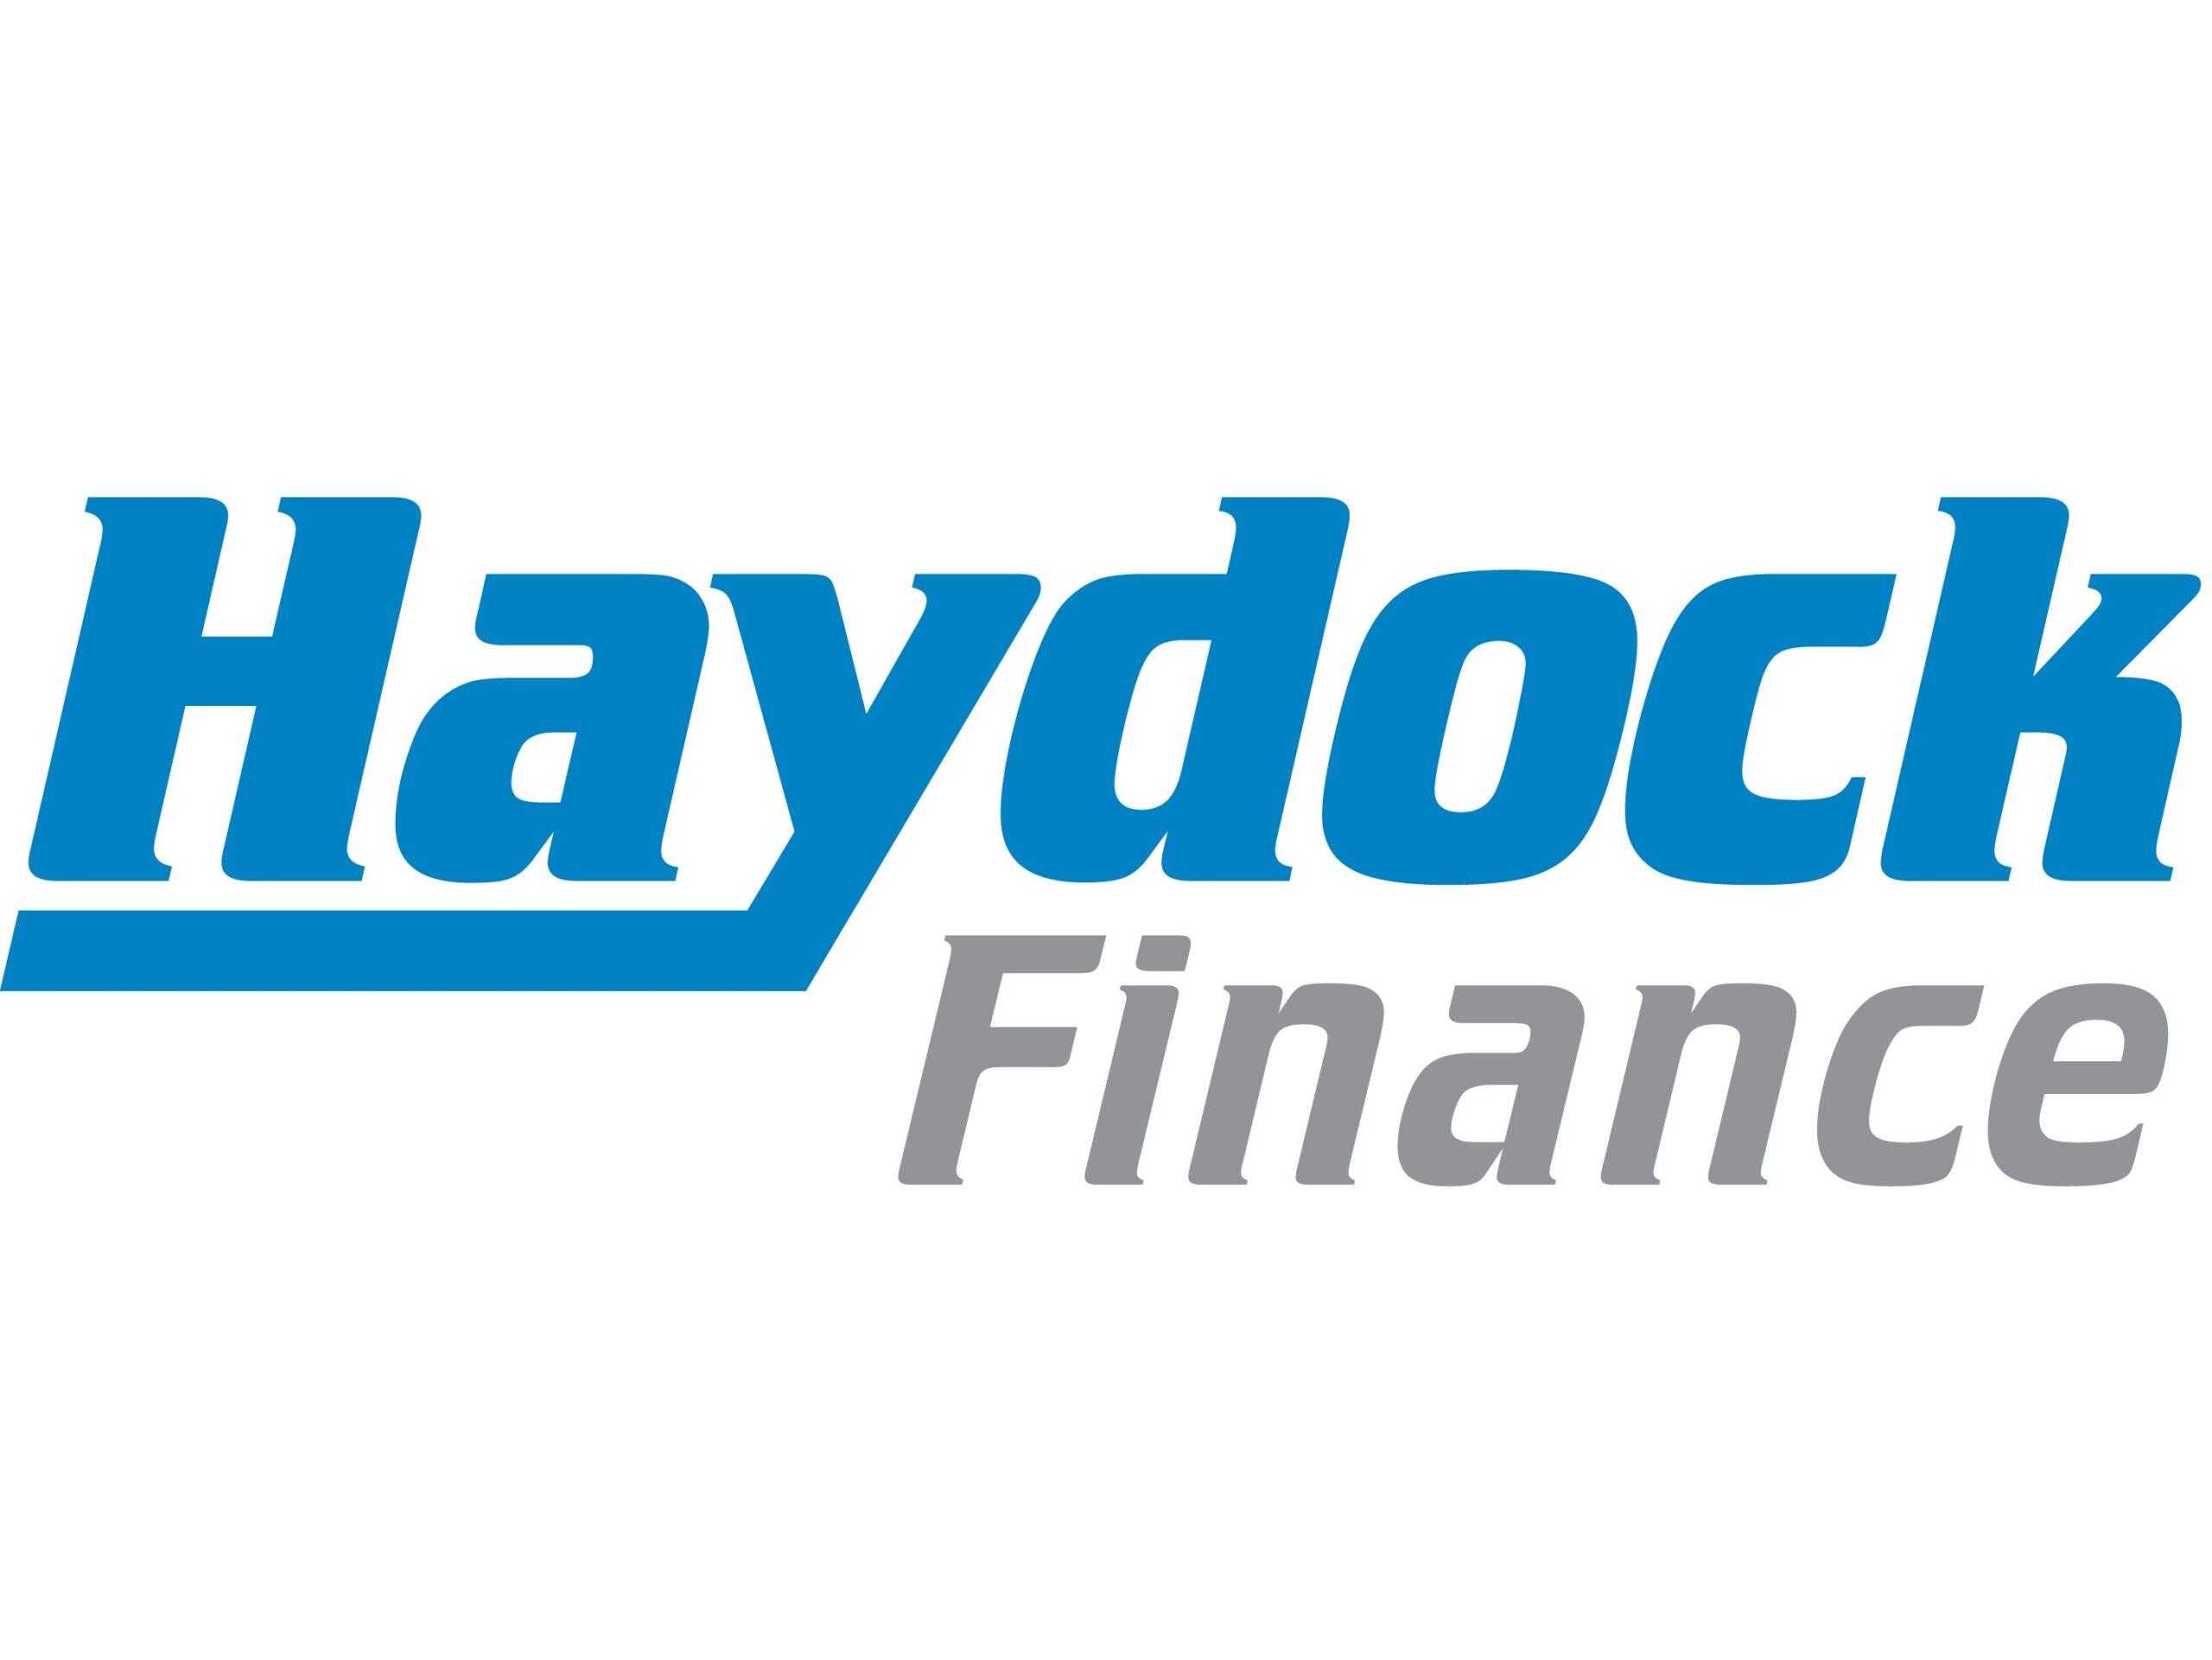 Haydock reveals its revived branding